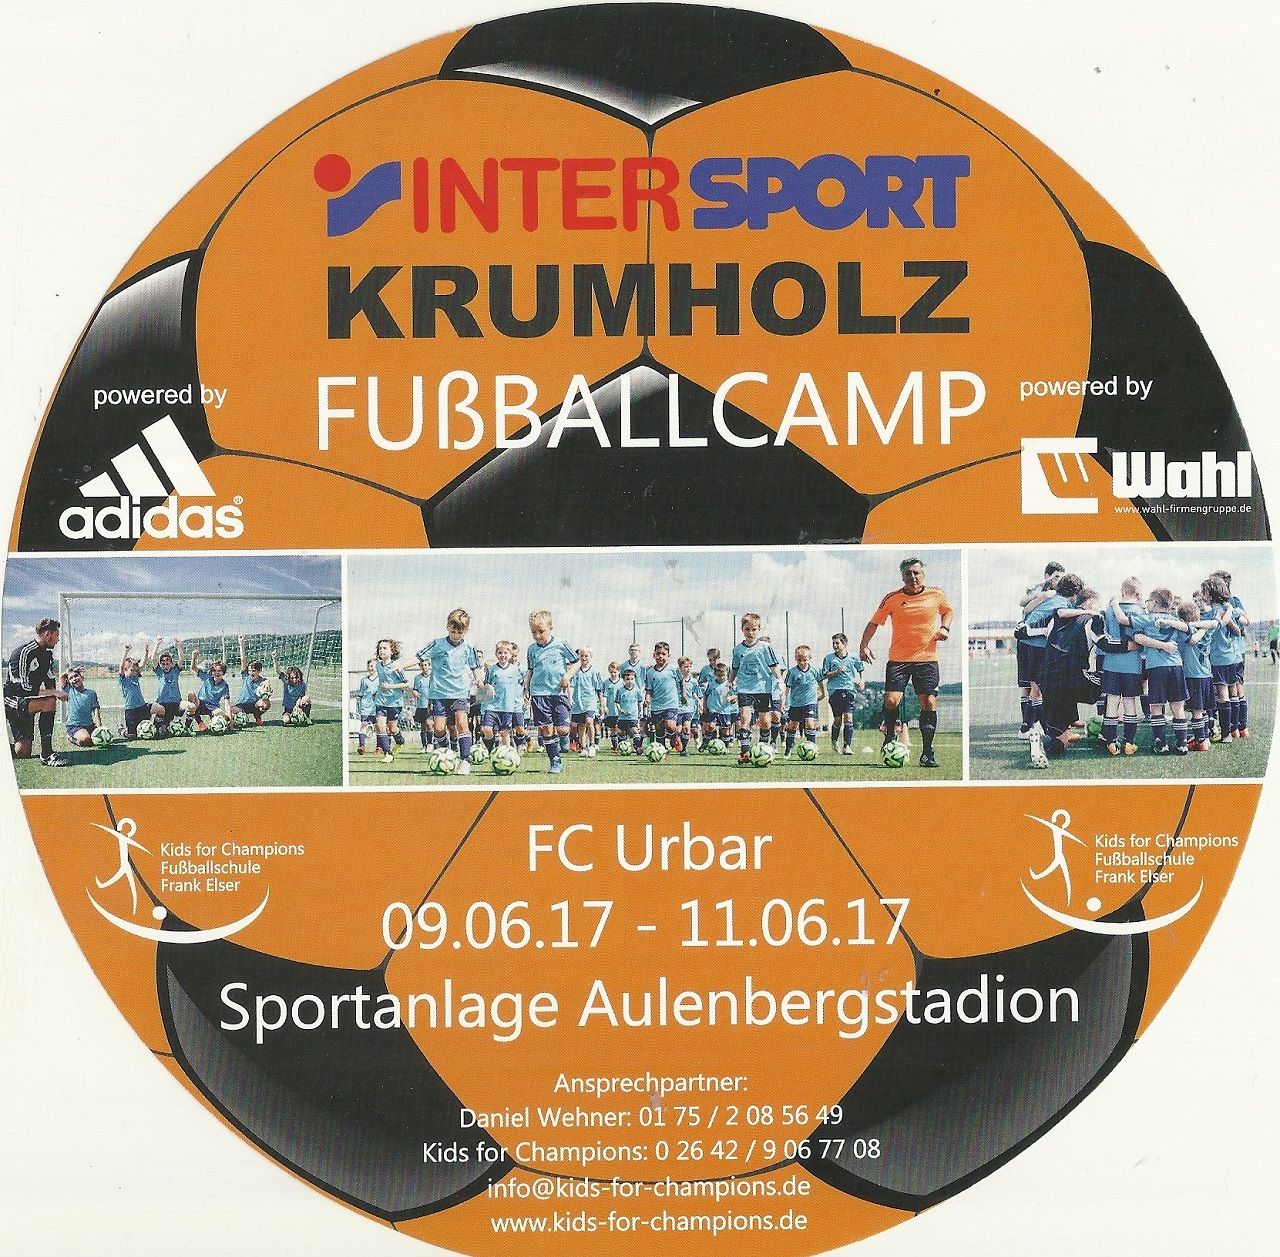 Intersport Krumholz Fußballcamp 2017